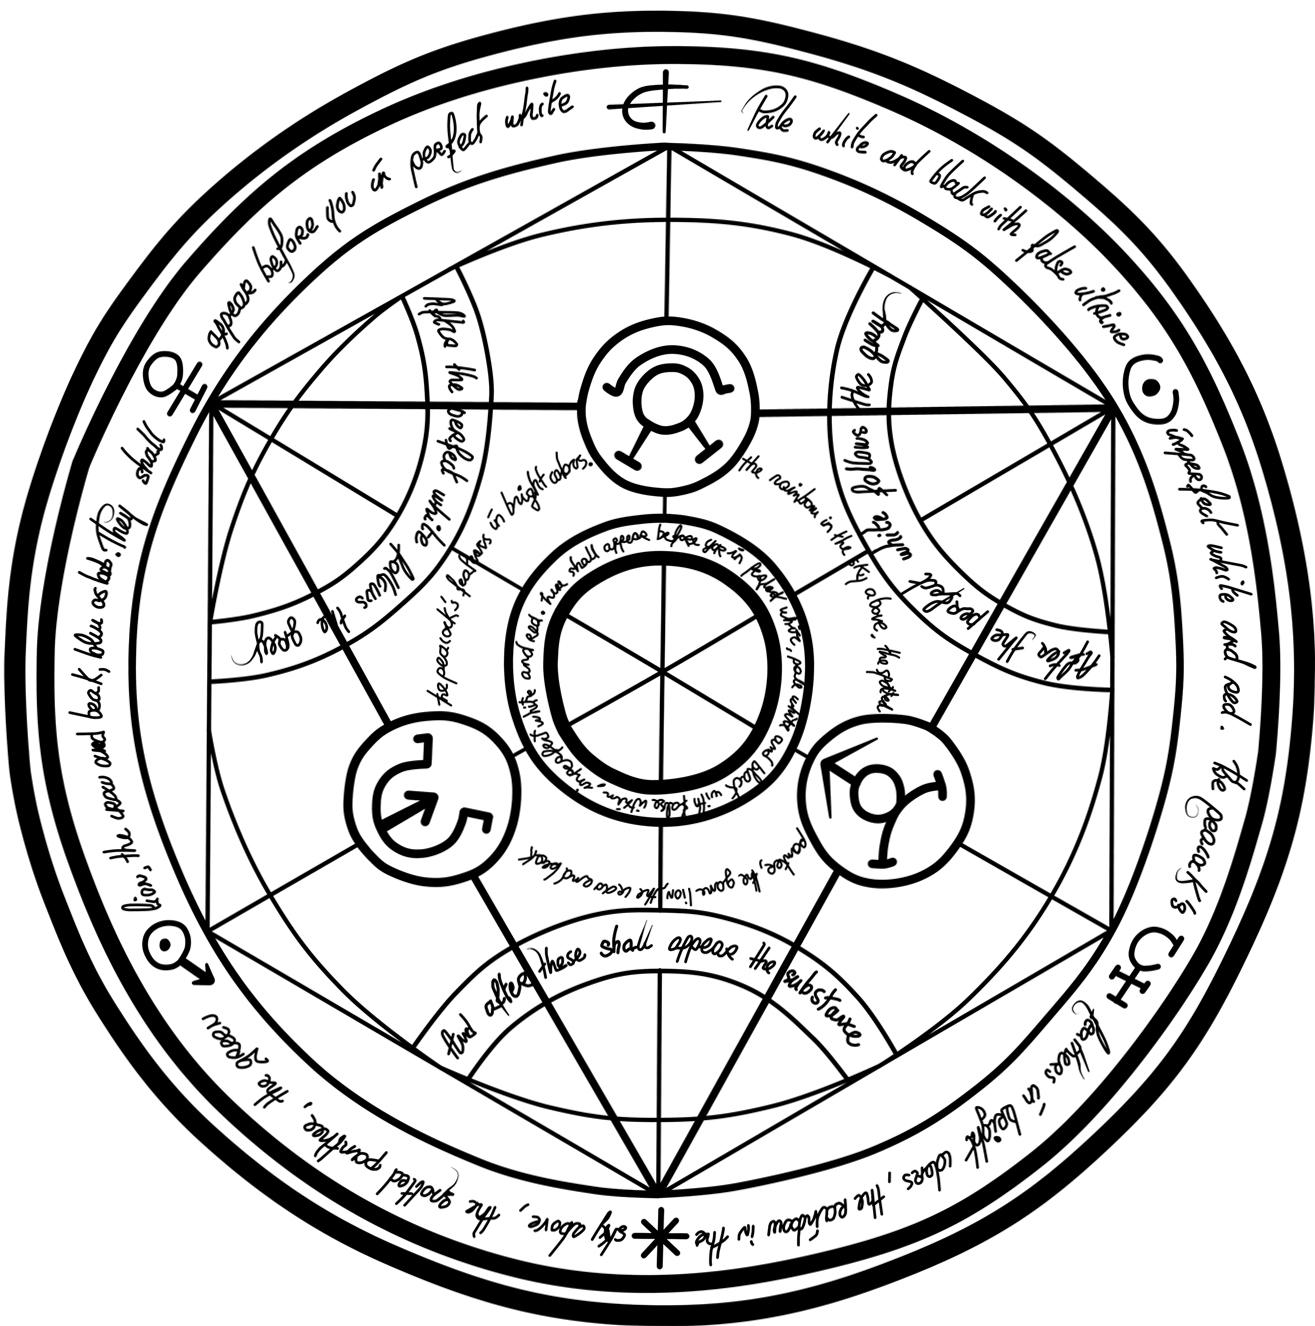 [Obrazek: human_transmutation_circle_by_Solarifur.jpg]